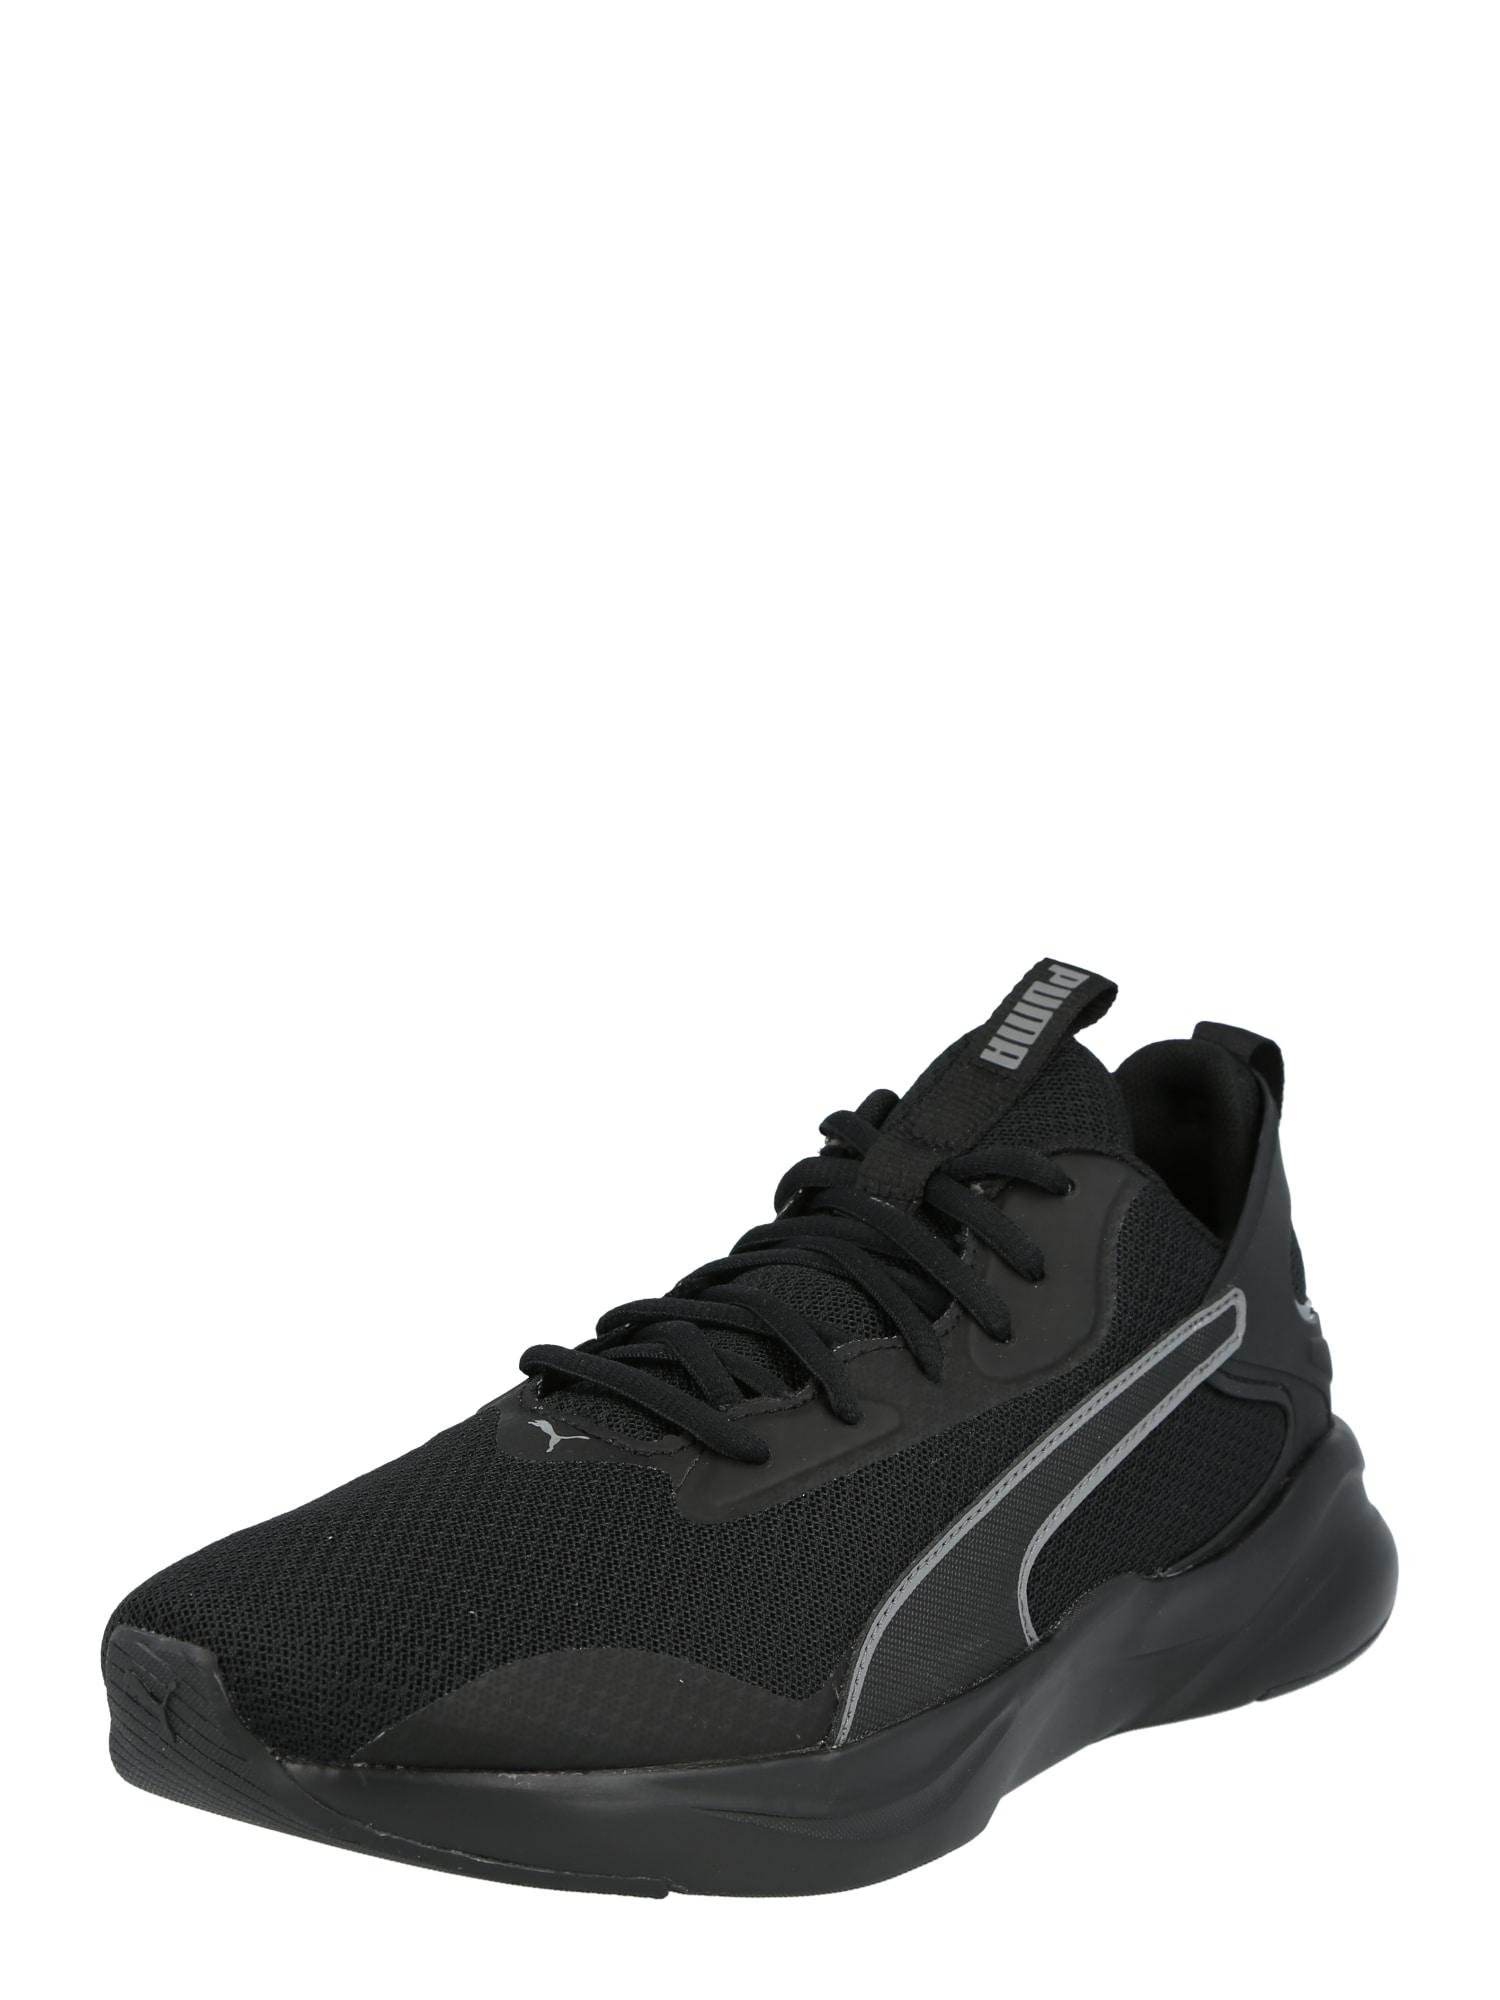 PUMA Bėgimo batai juoda / balta